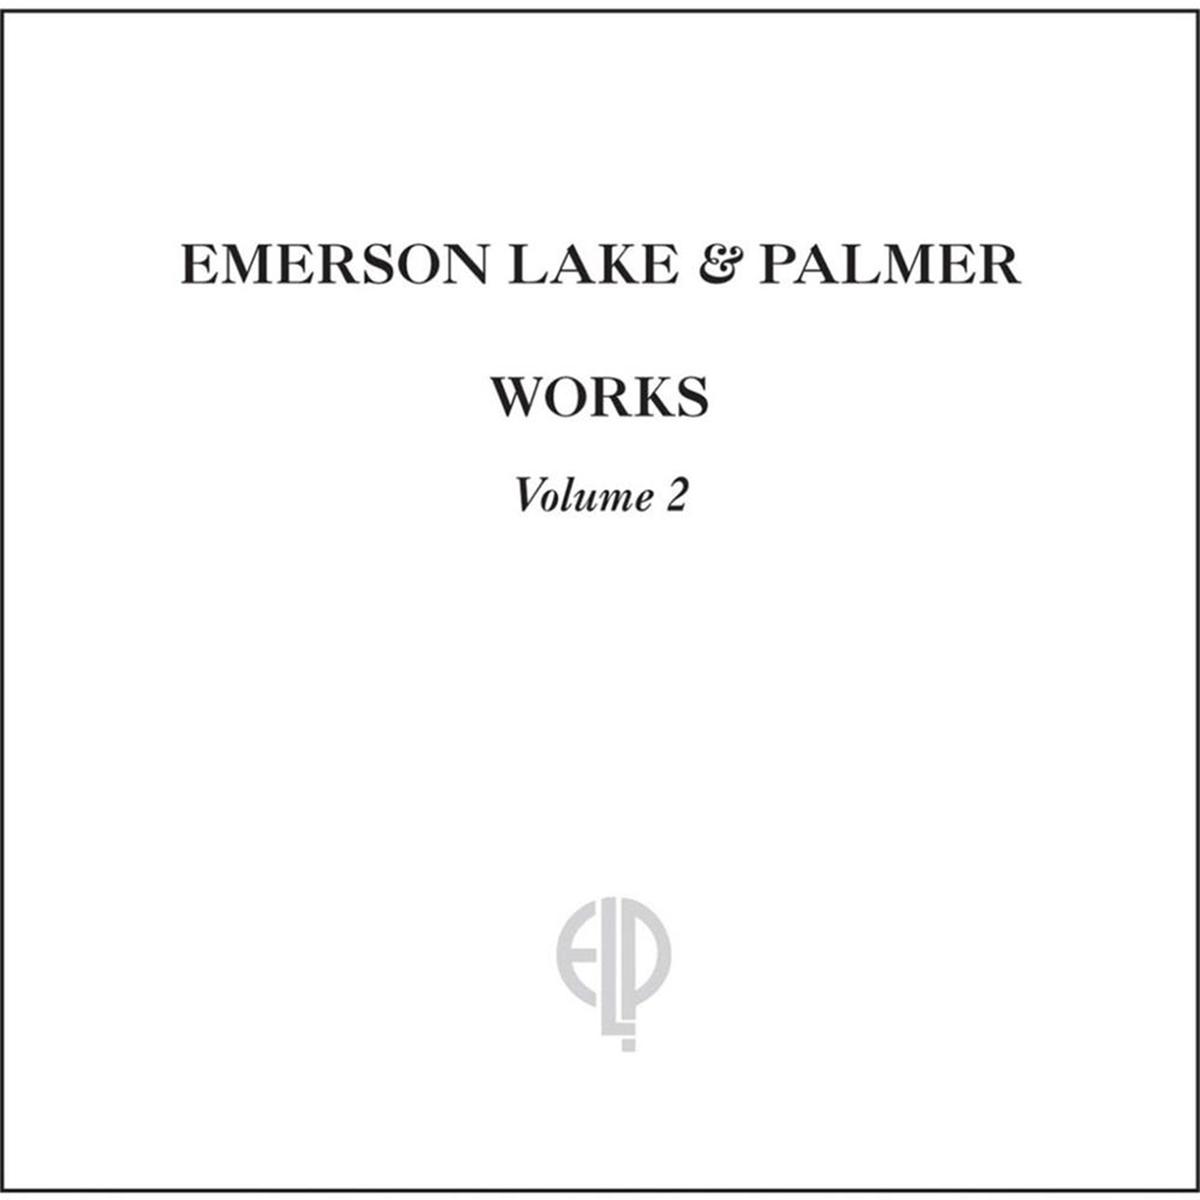 Emerson Lake Palmer Works Volume 2